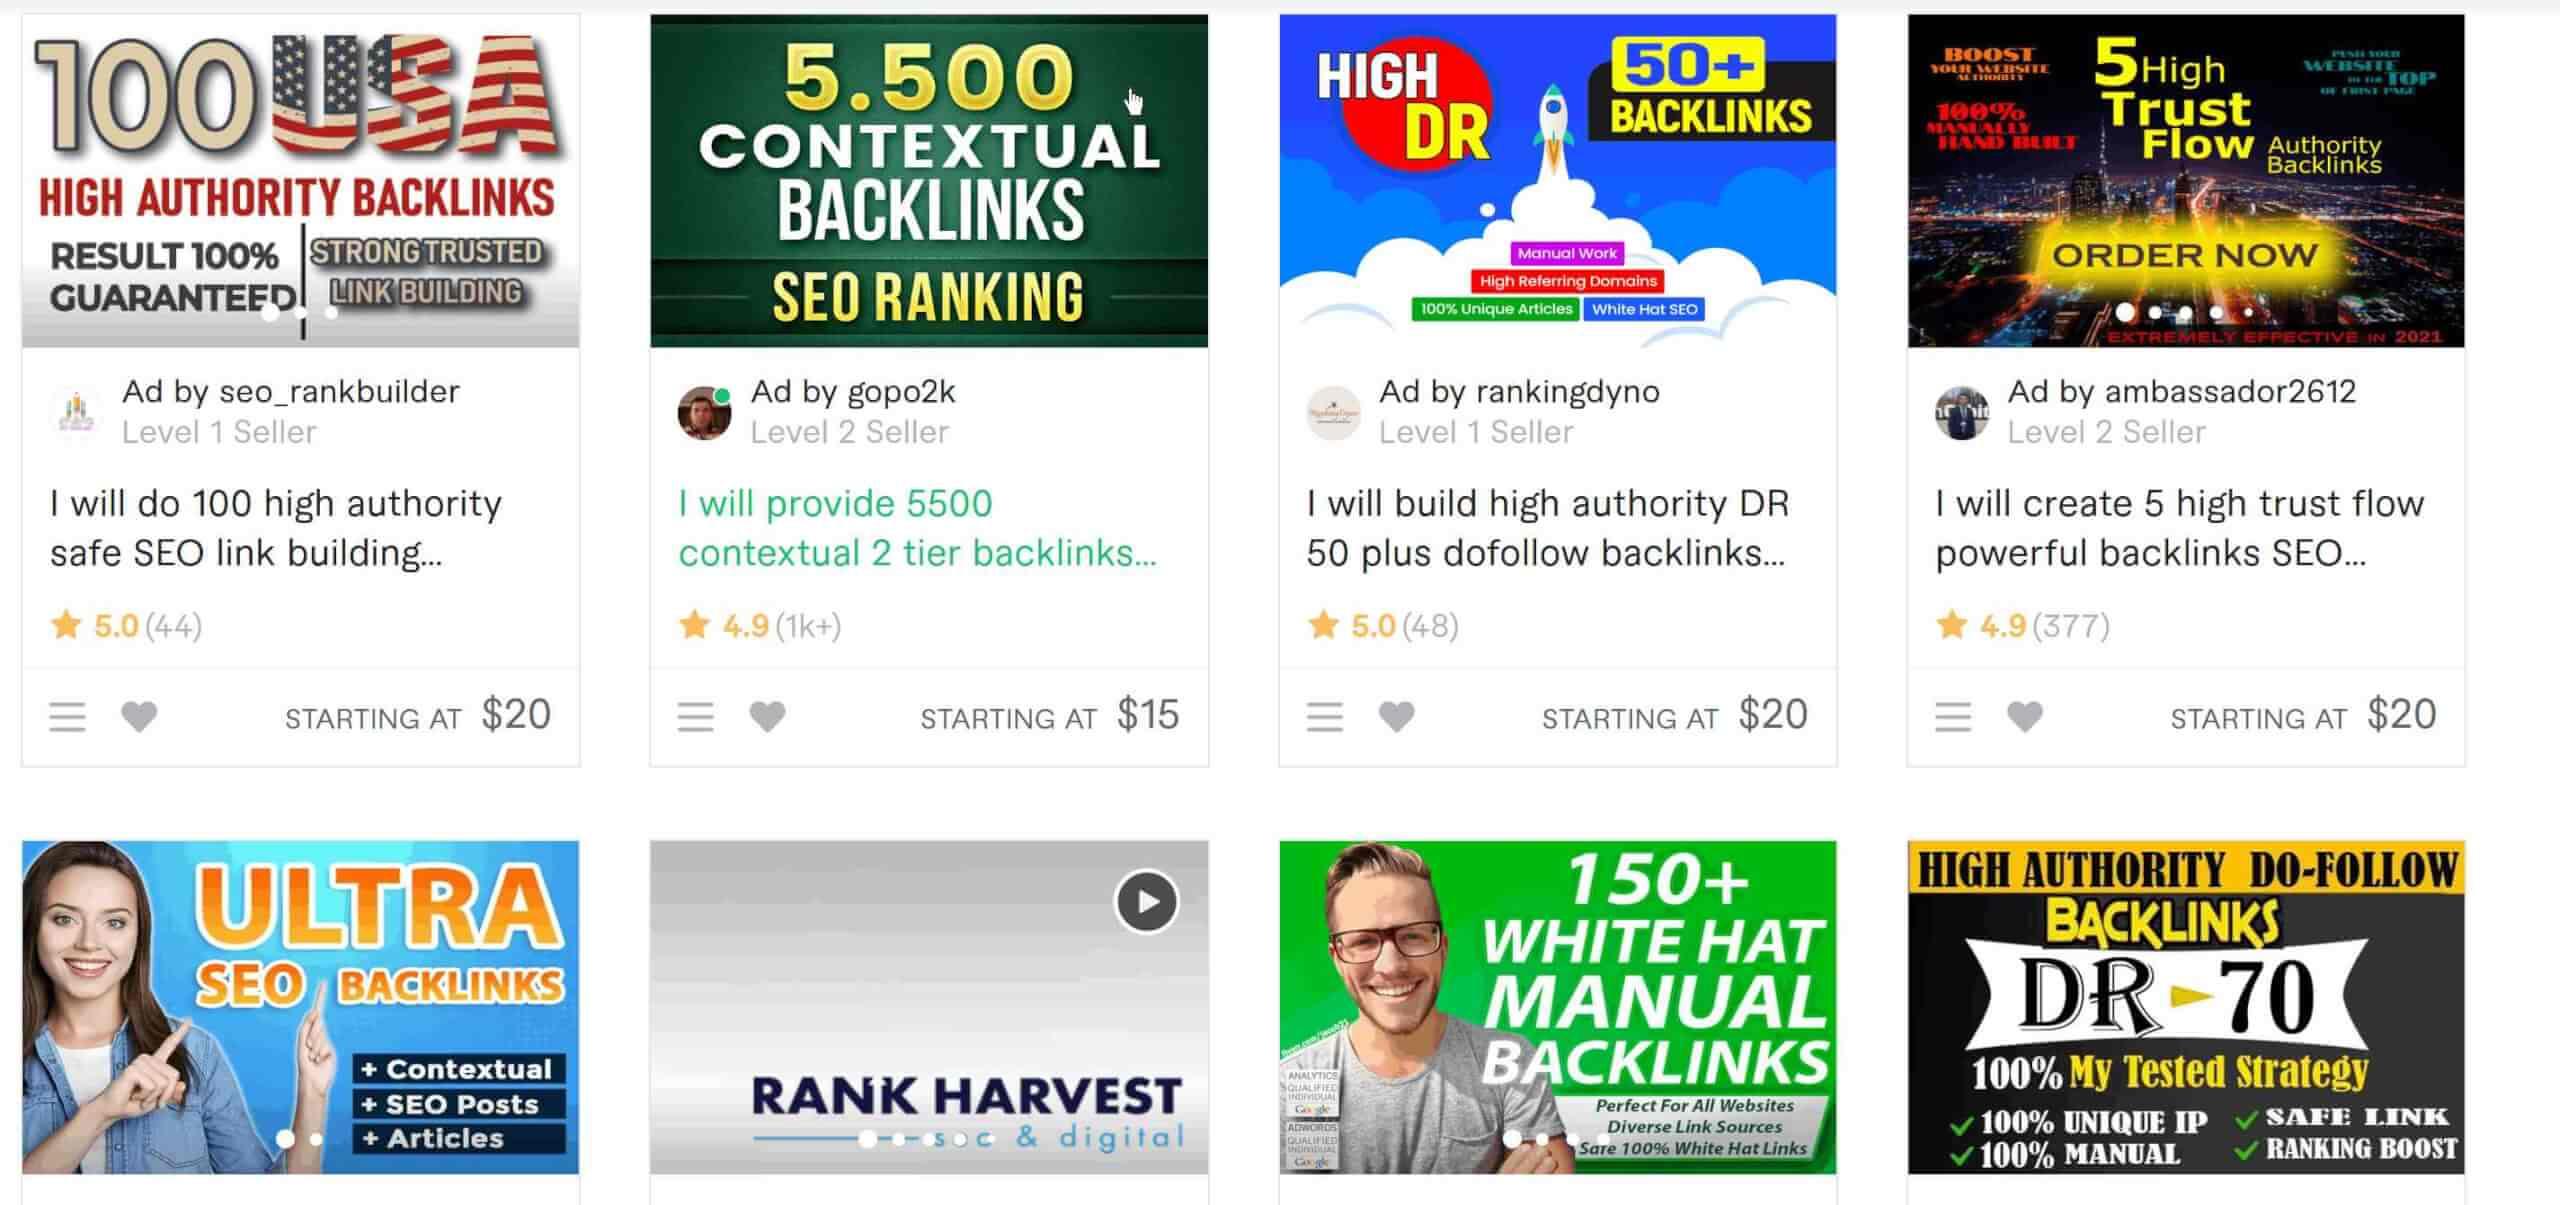 Fiverr als Alternative fuer Backlinked